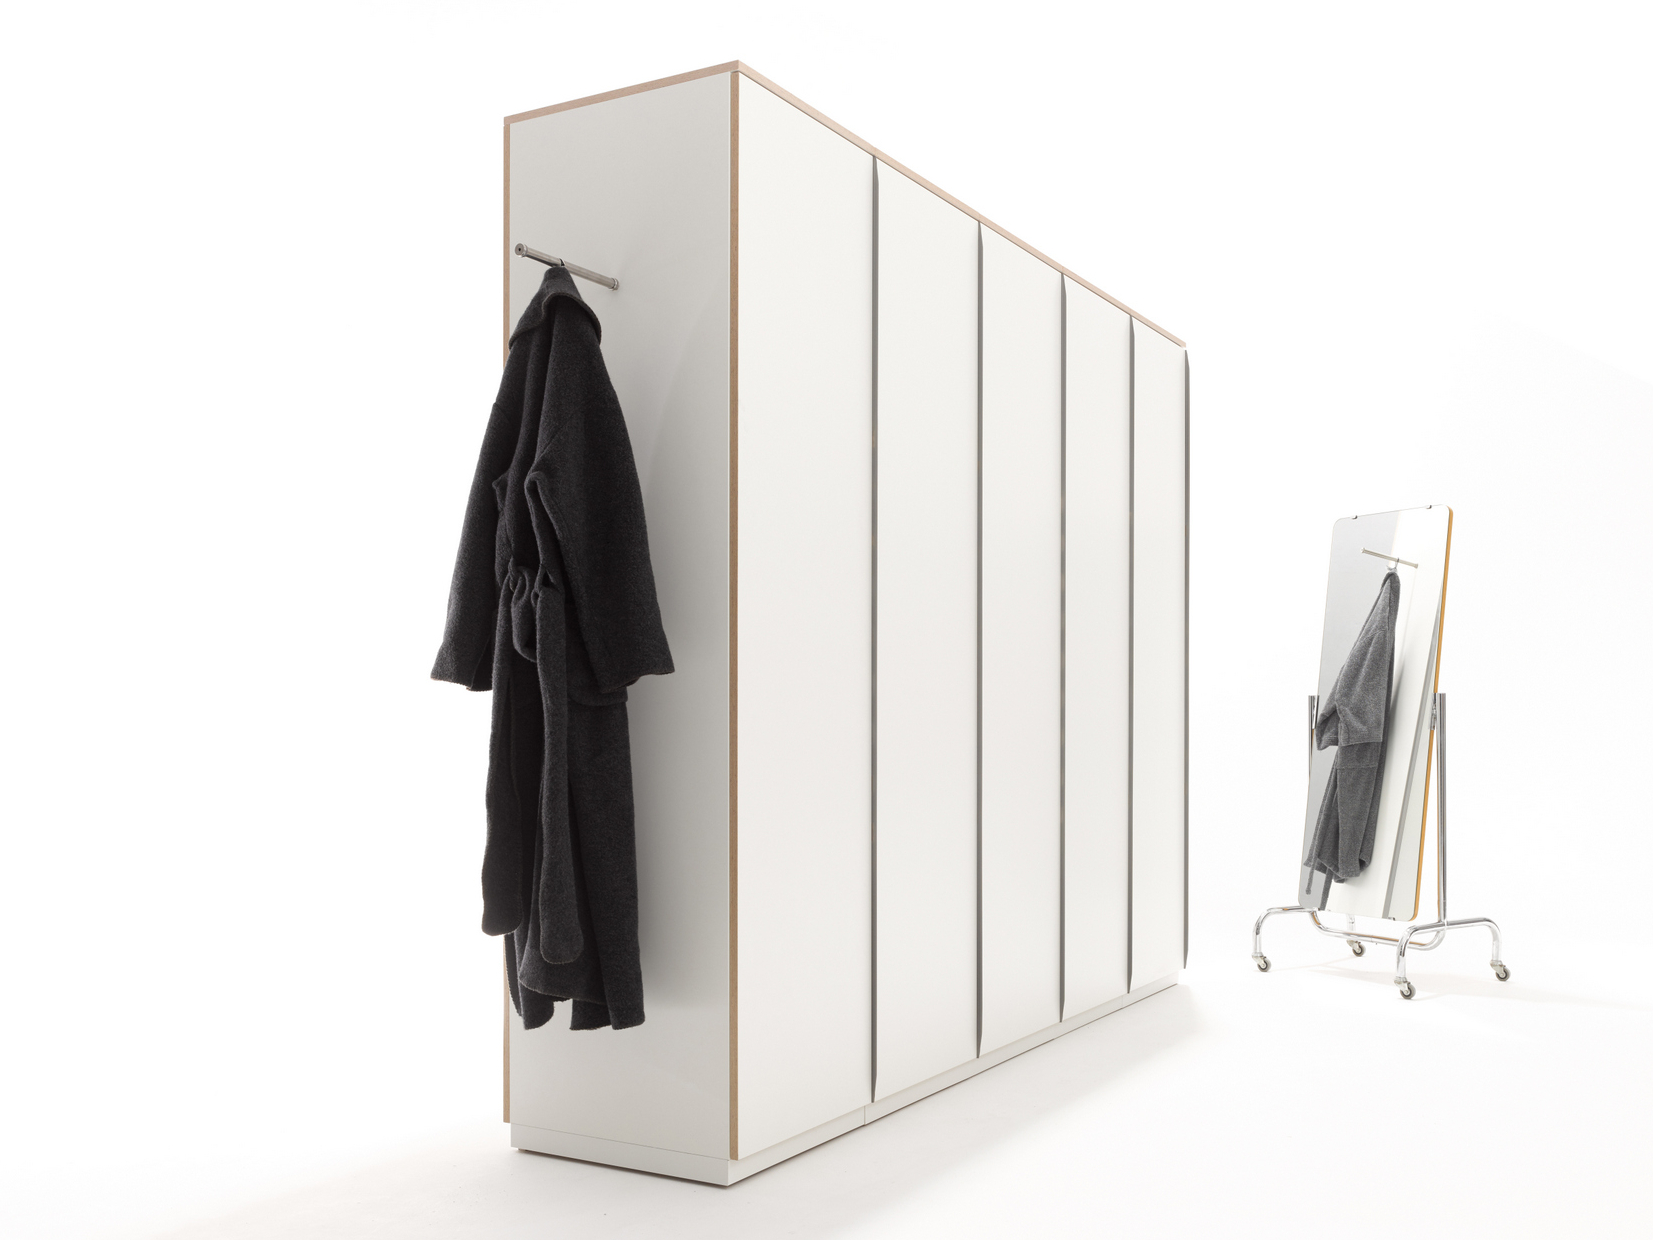 Modular 16 anbau kleiderschrank kollektion modular 16 by müller ...